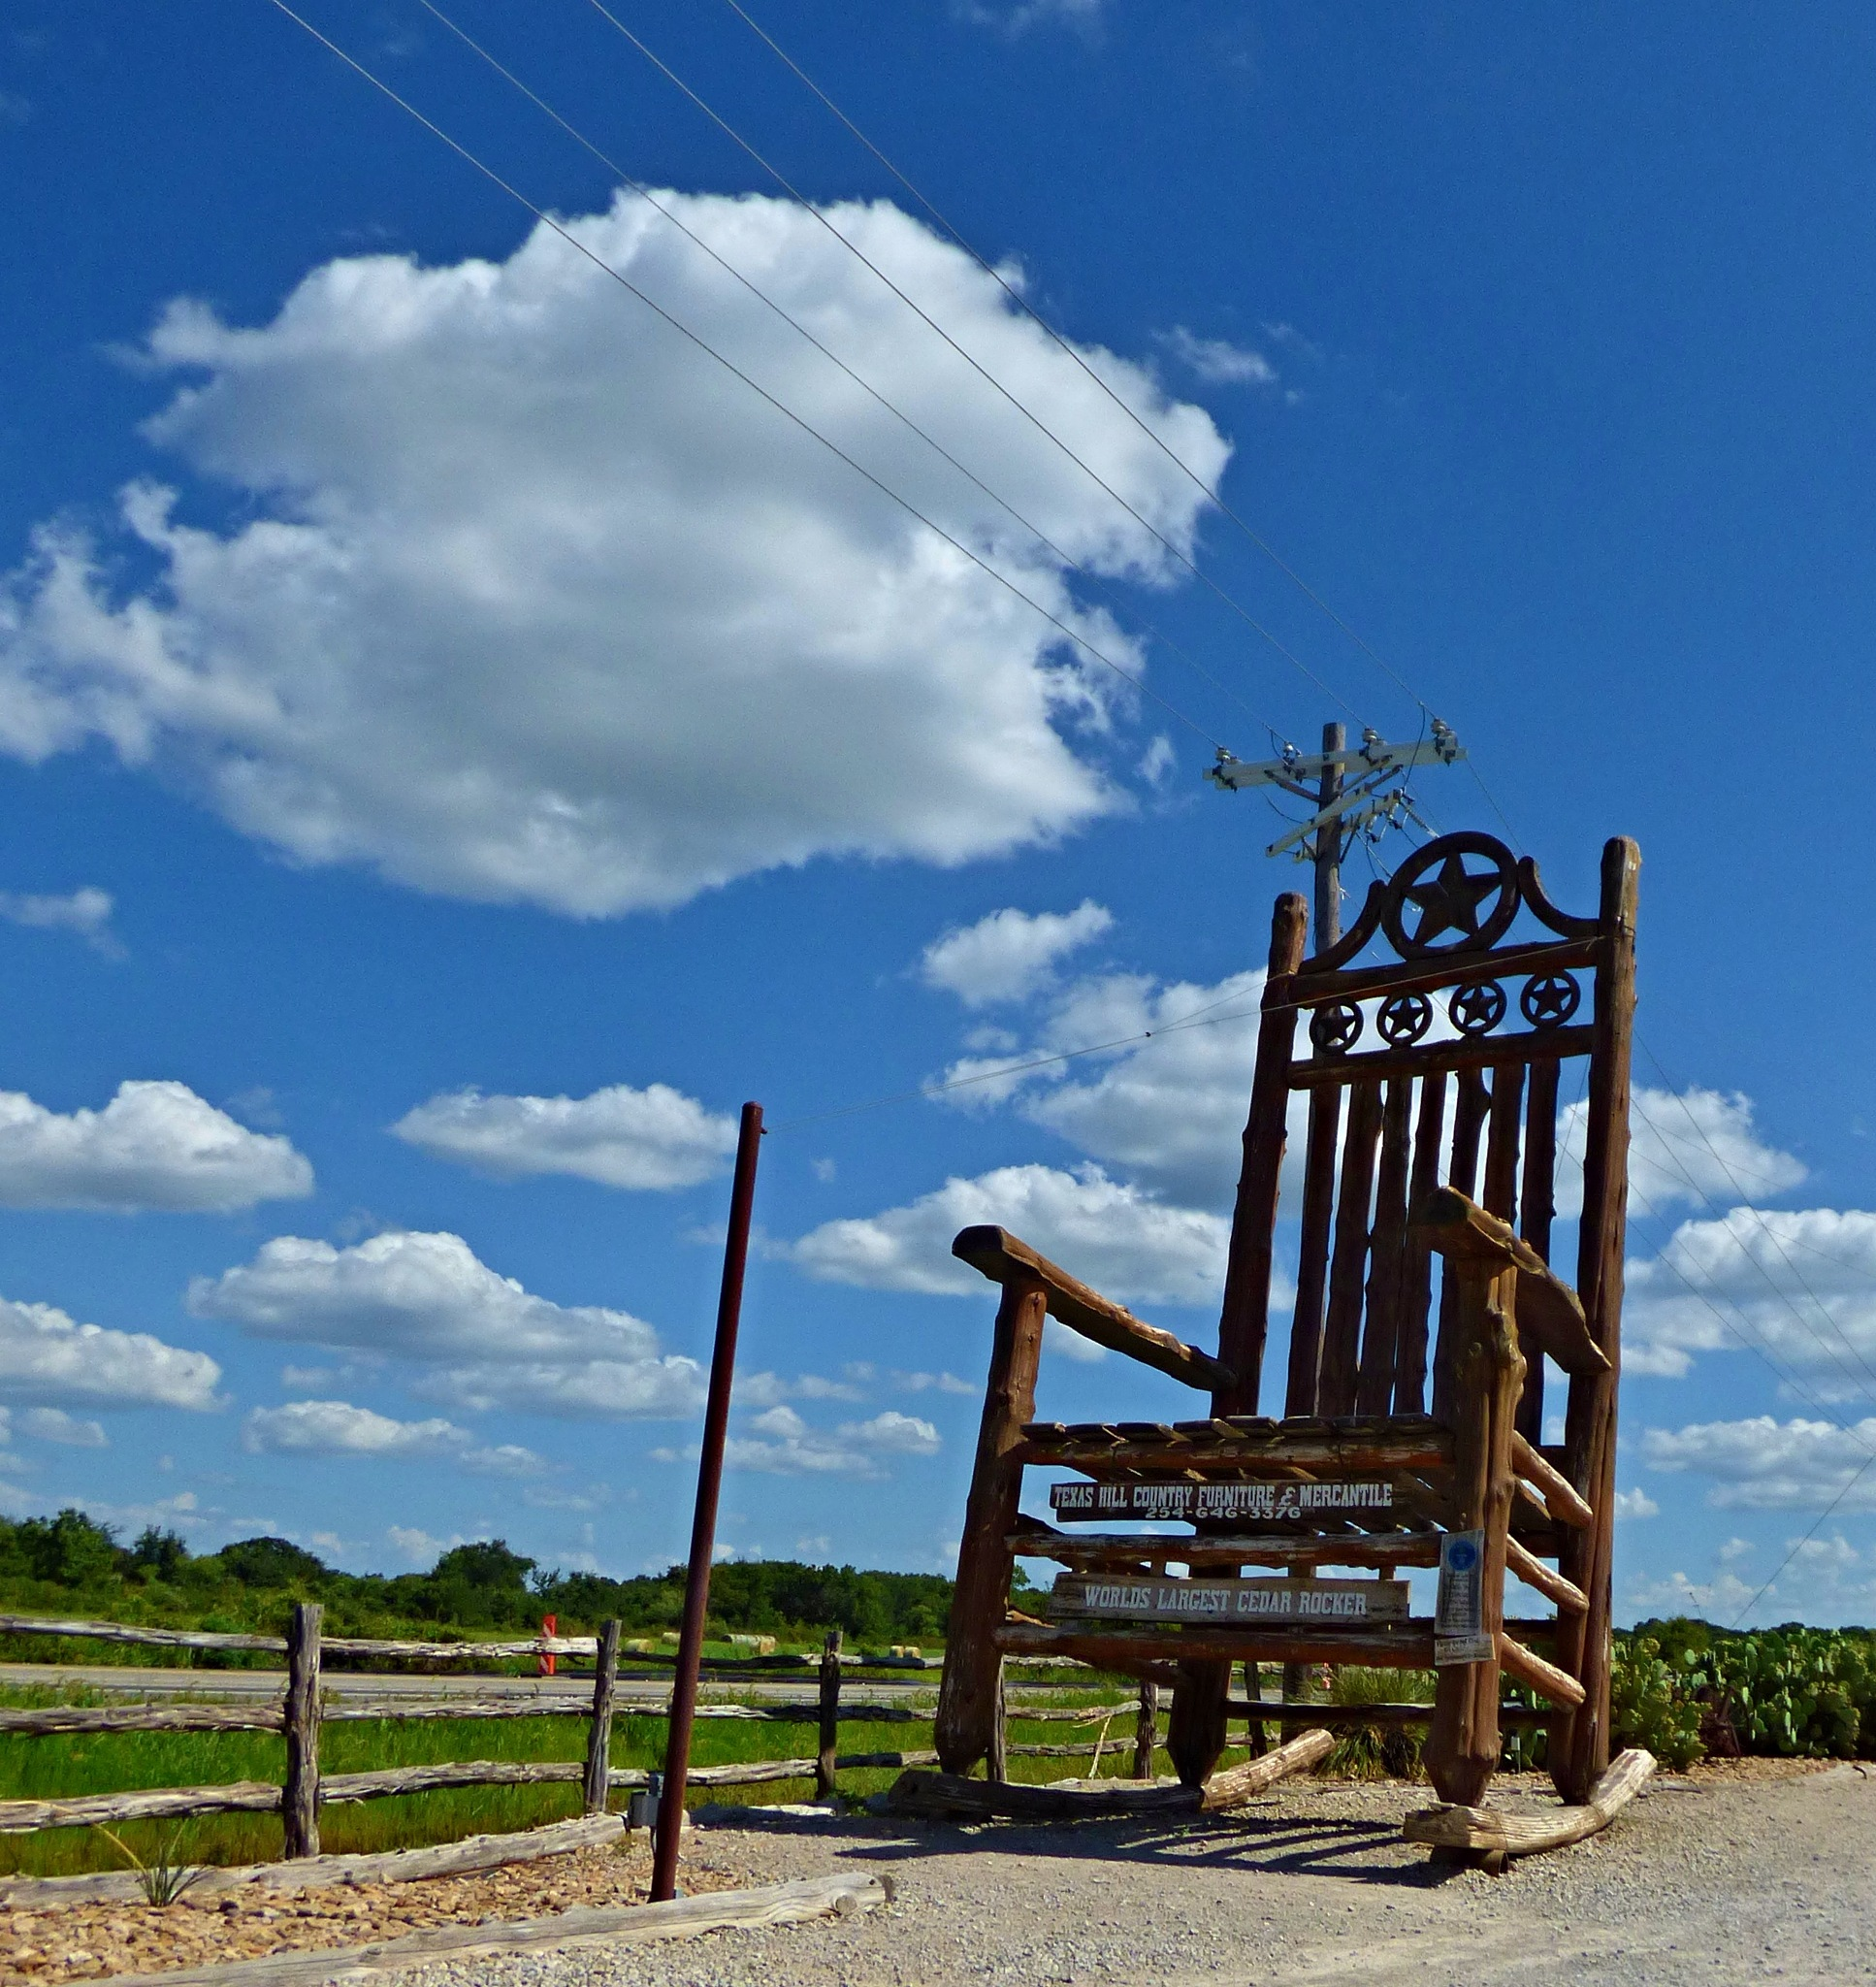 Texas Sized Rocking Chair by nita.andrews.7